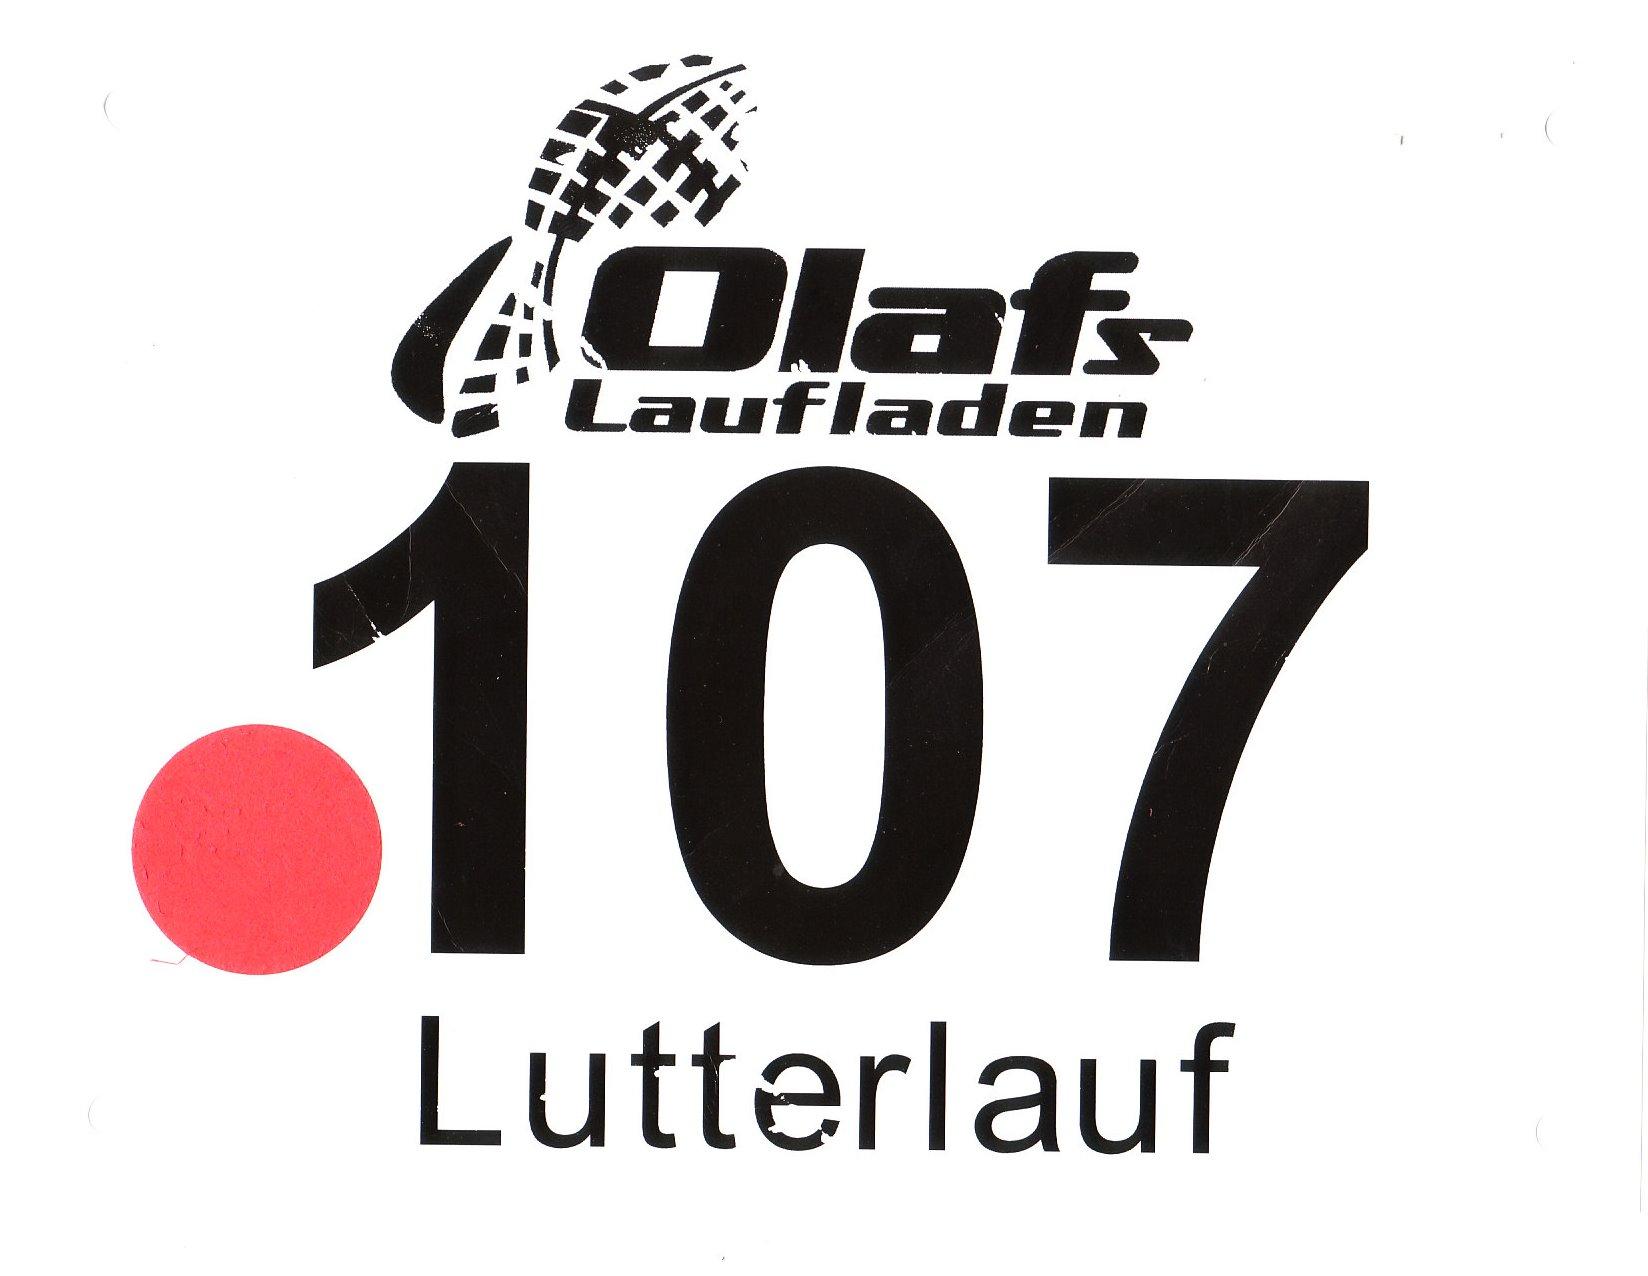 Lutterlauf Marienfeld 2017 - Startnummer